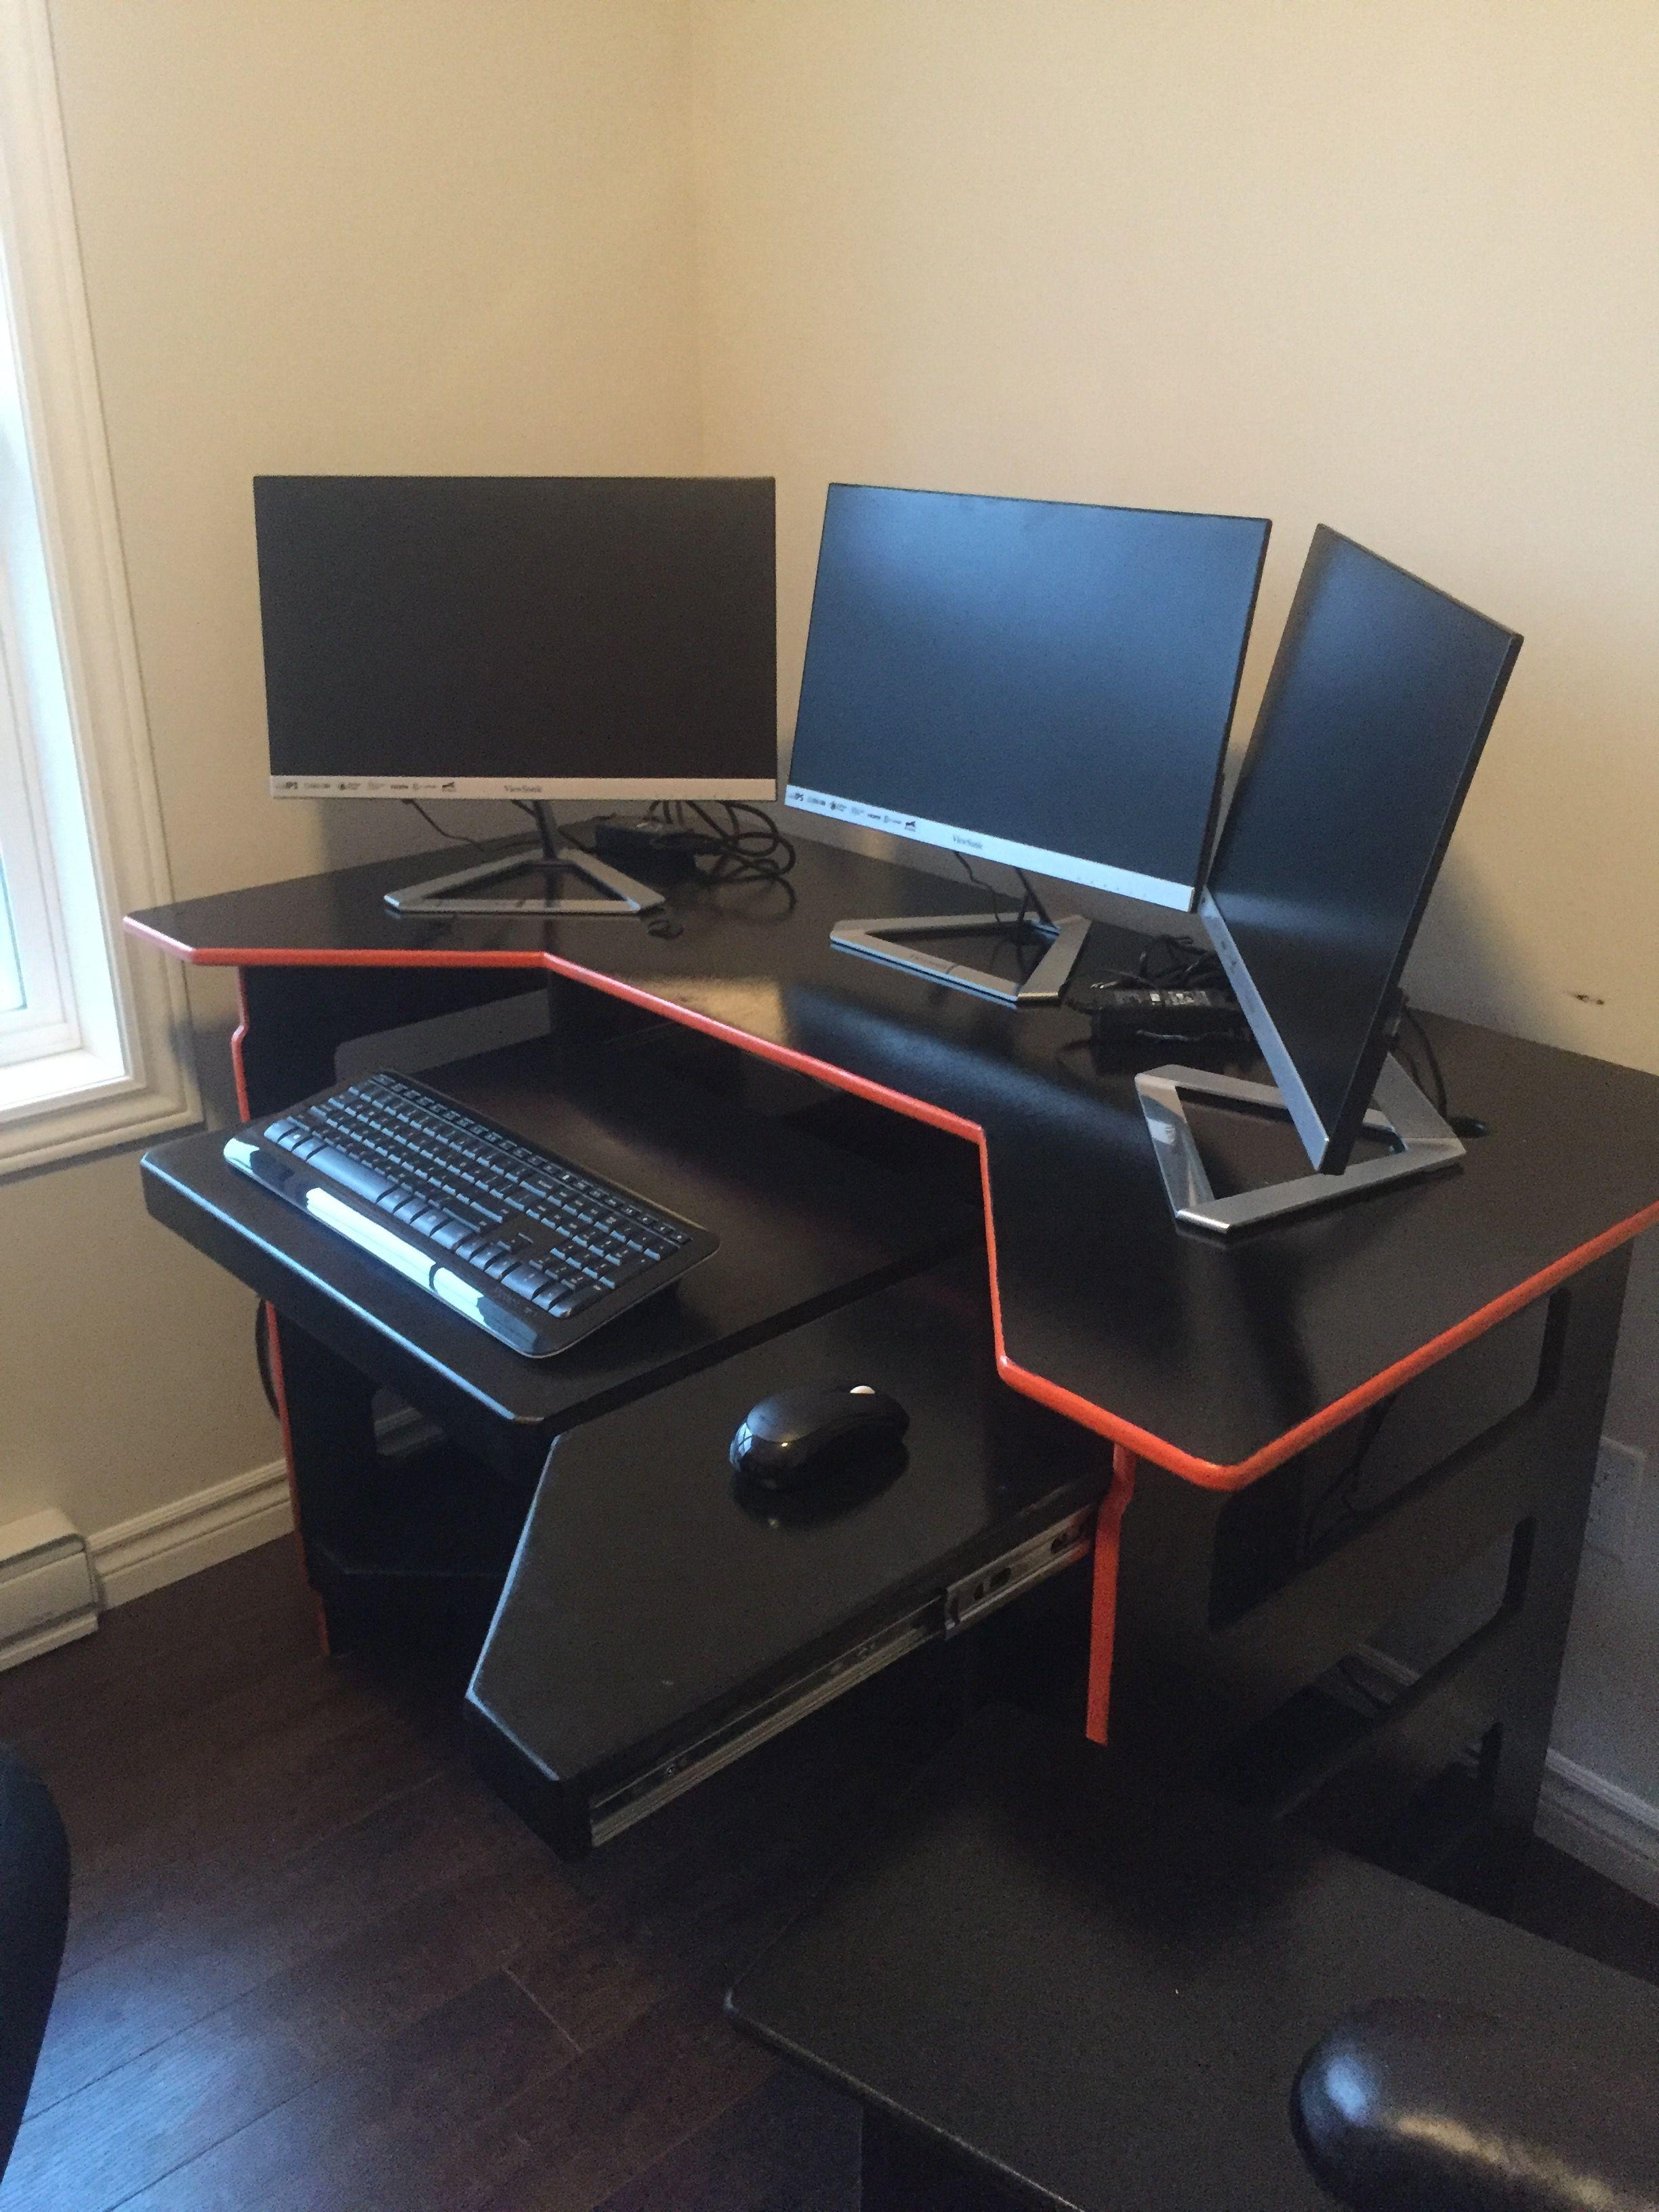 Gaming Desks | Gaming Desks | Pinterest | Gaming desk ...